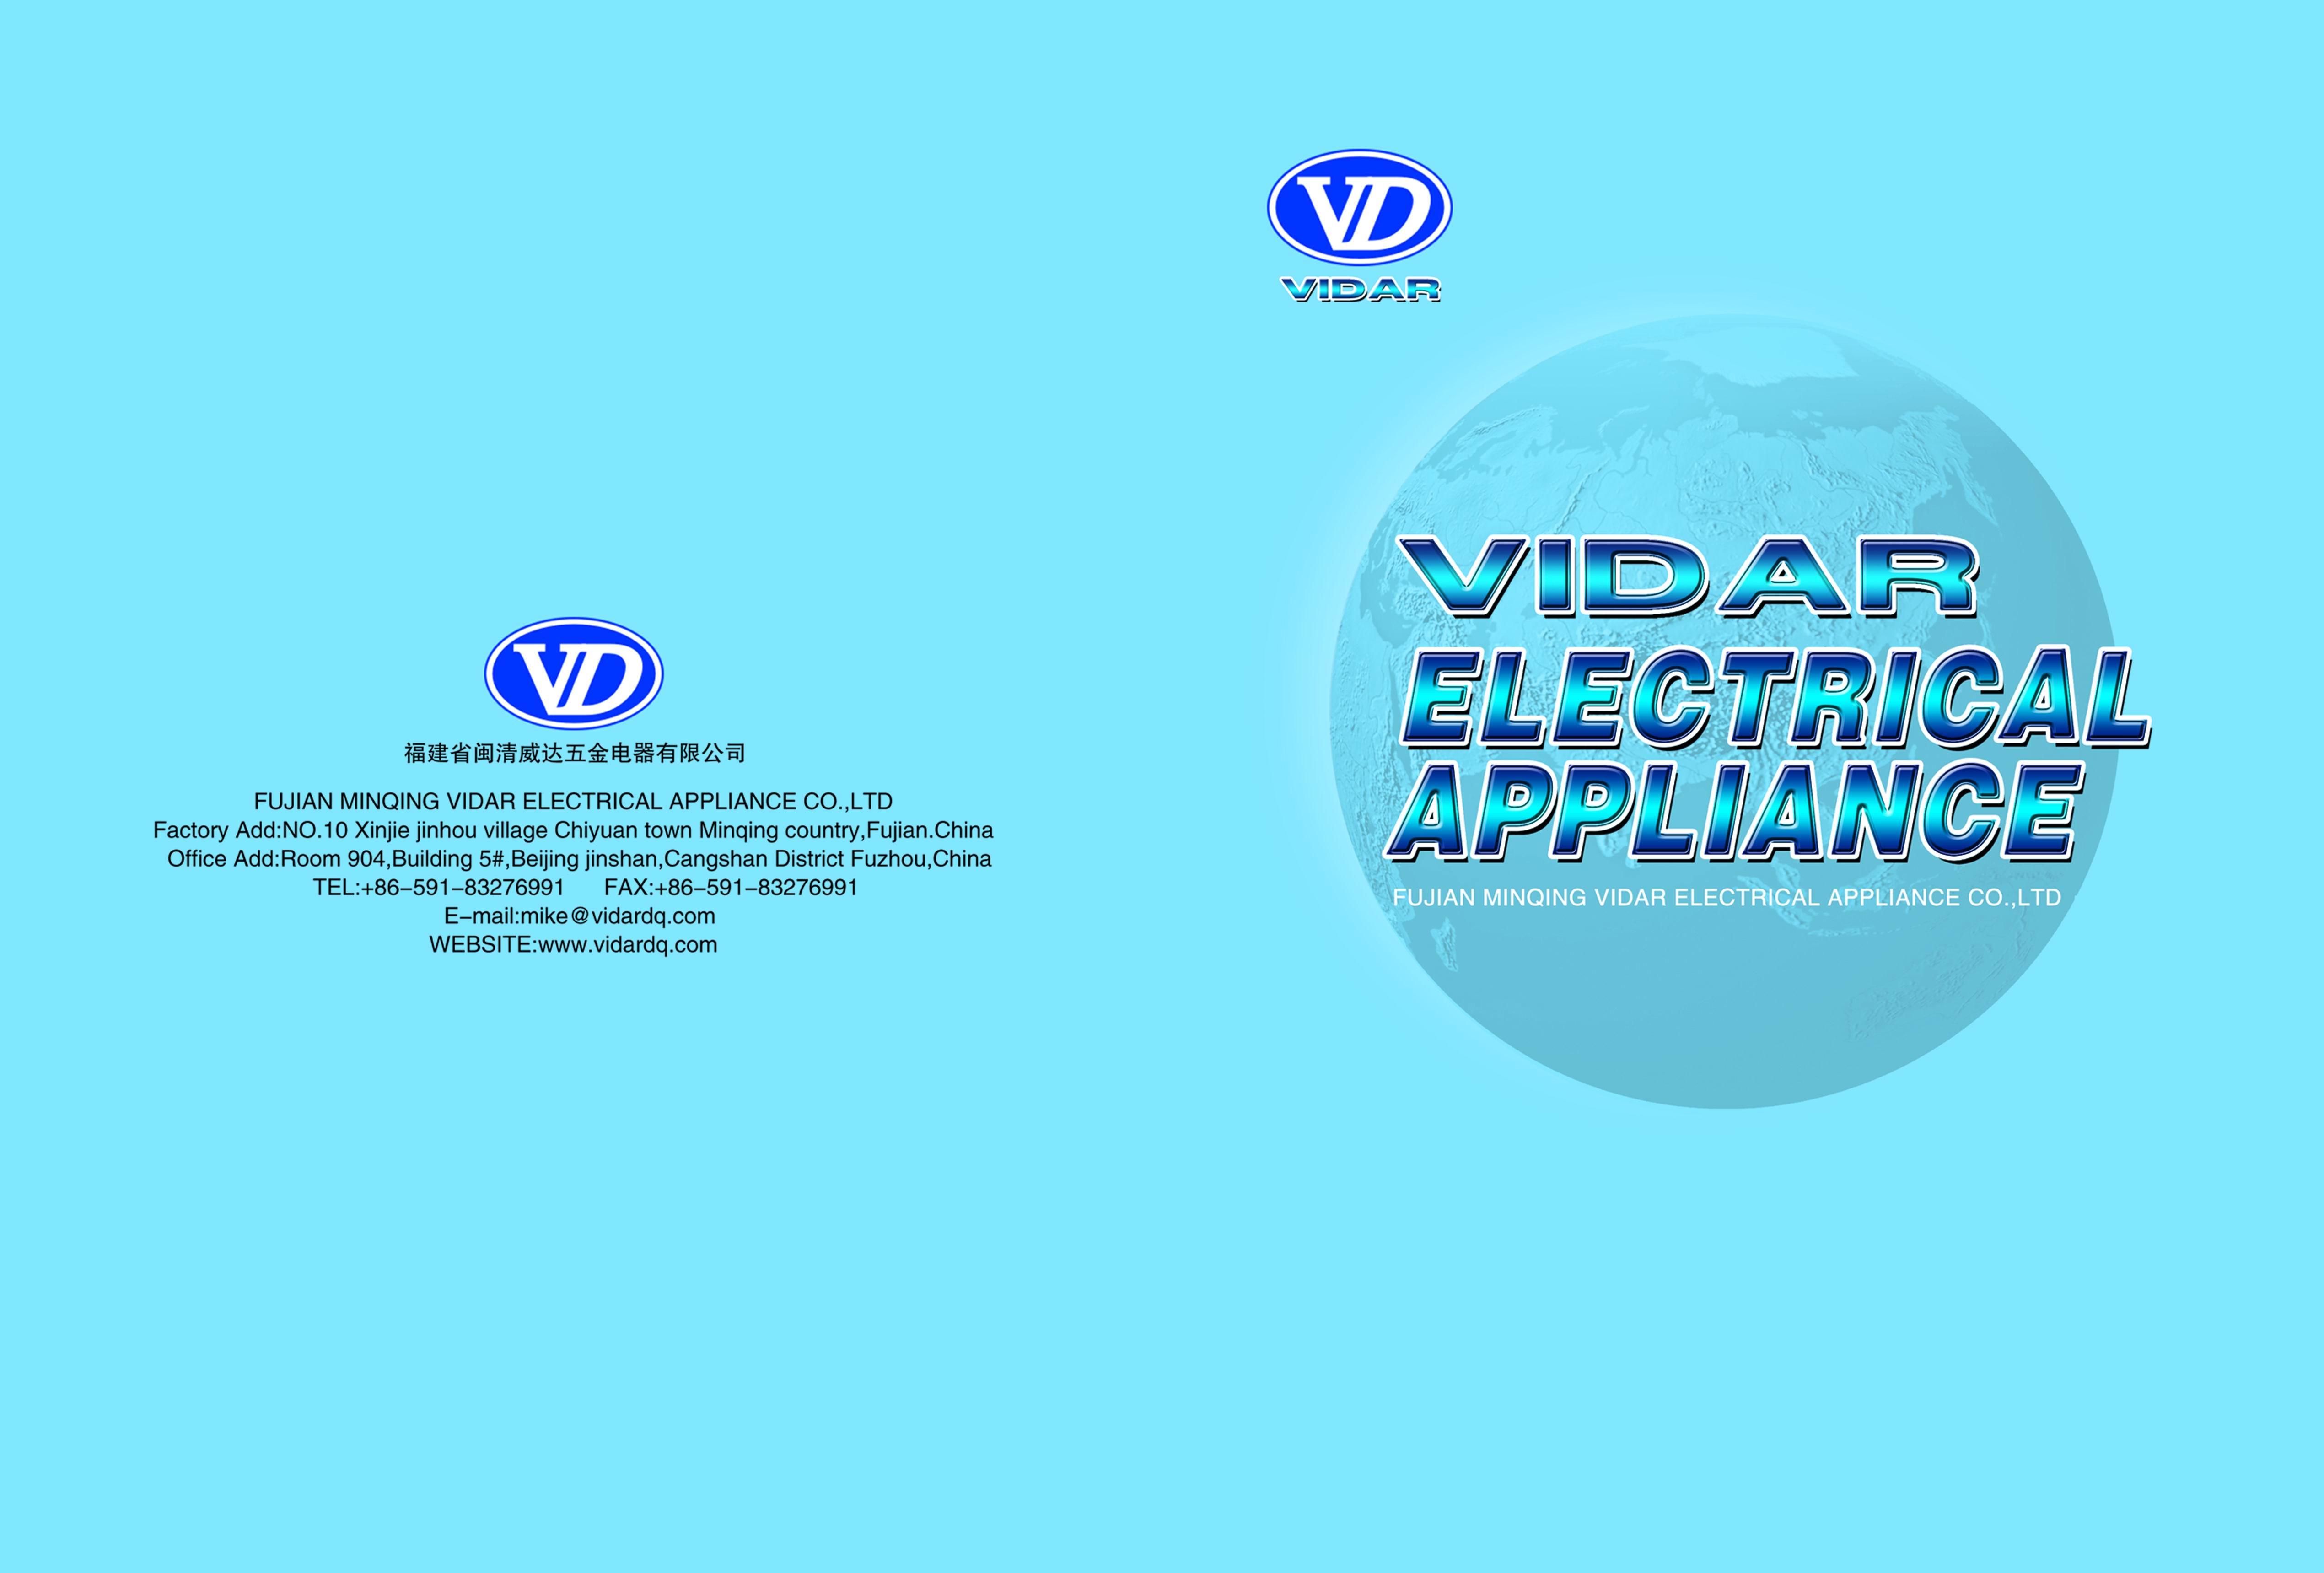 VIDAR ELECTRICAL APPLIANCE CO., LTD